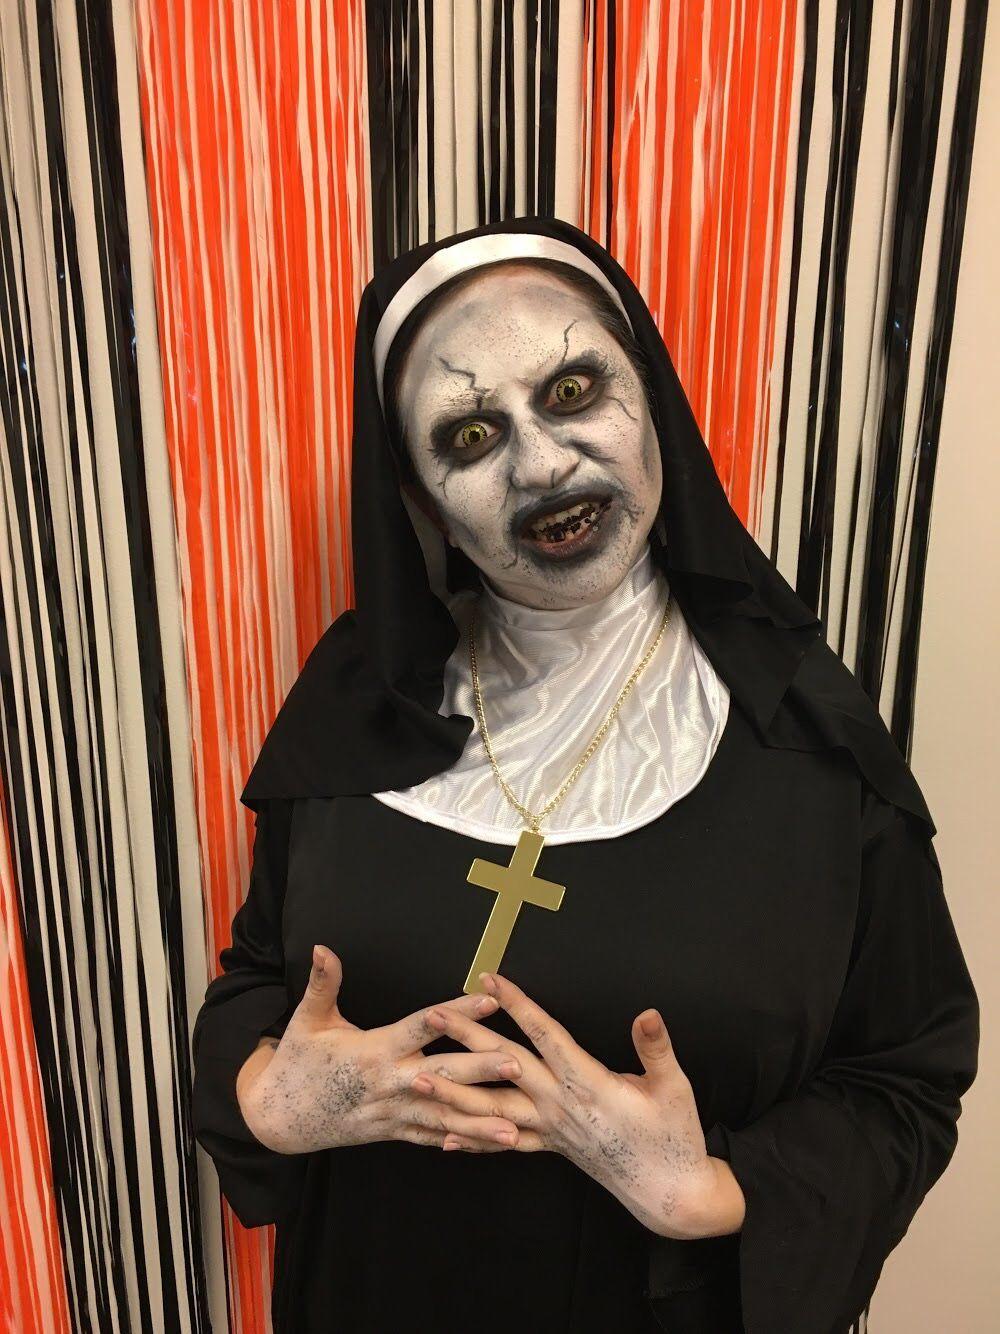 Crazy Halloween Ideas.Mfw You Win The Office Halloween Contest Happy Halloween Https Imgur Com Xhvll9q Crazy Halloween Costumes Scary Halloween Costumes Halloween Contest